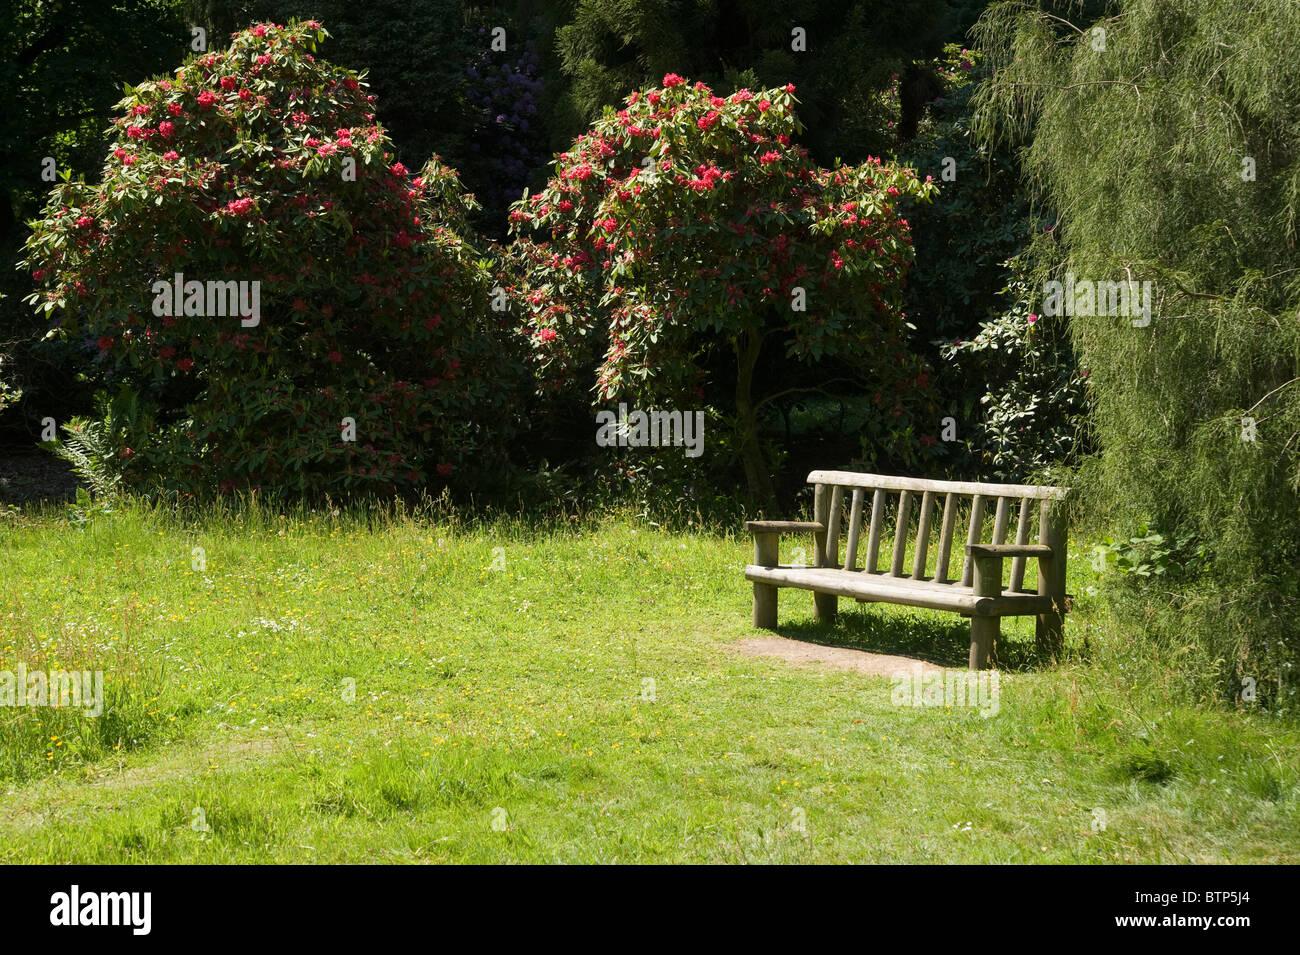 Banc dans jardin, Wiltshire, Royaume-Uni. Photo Stock